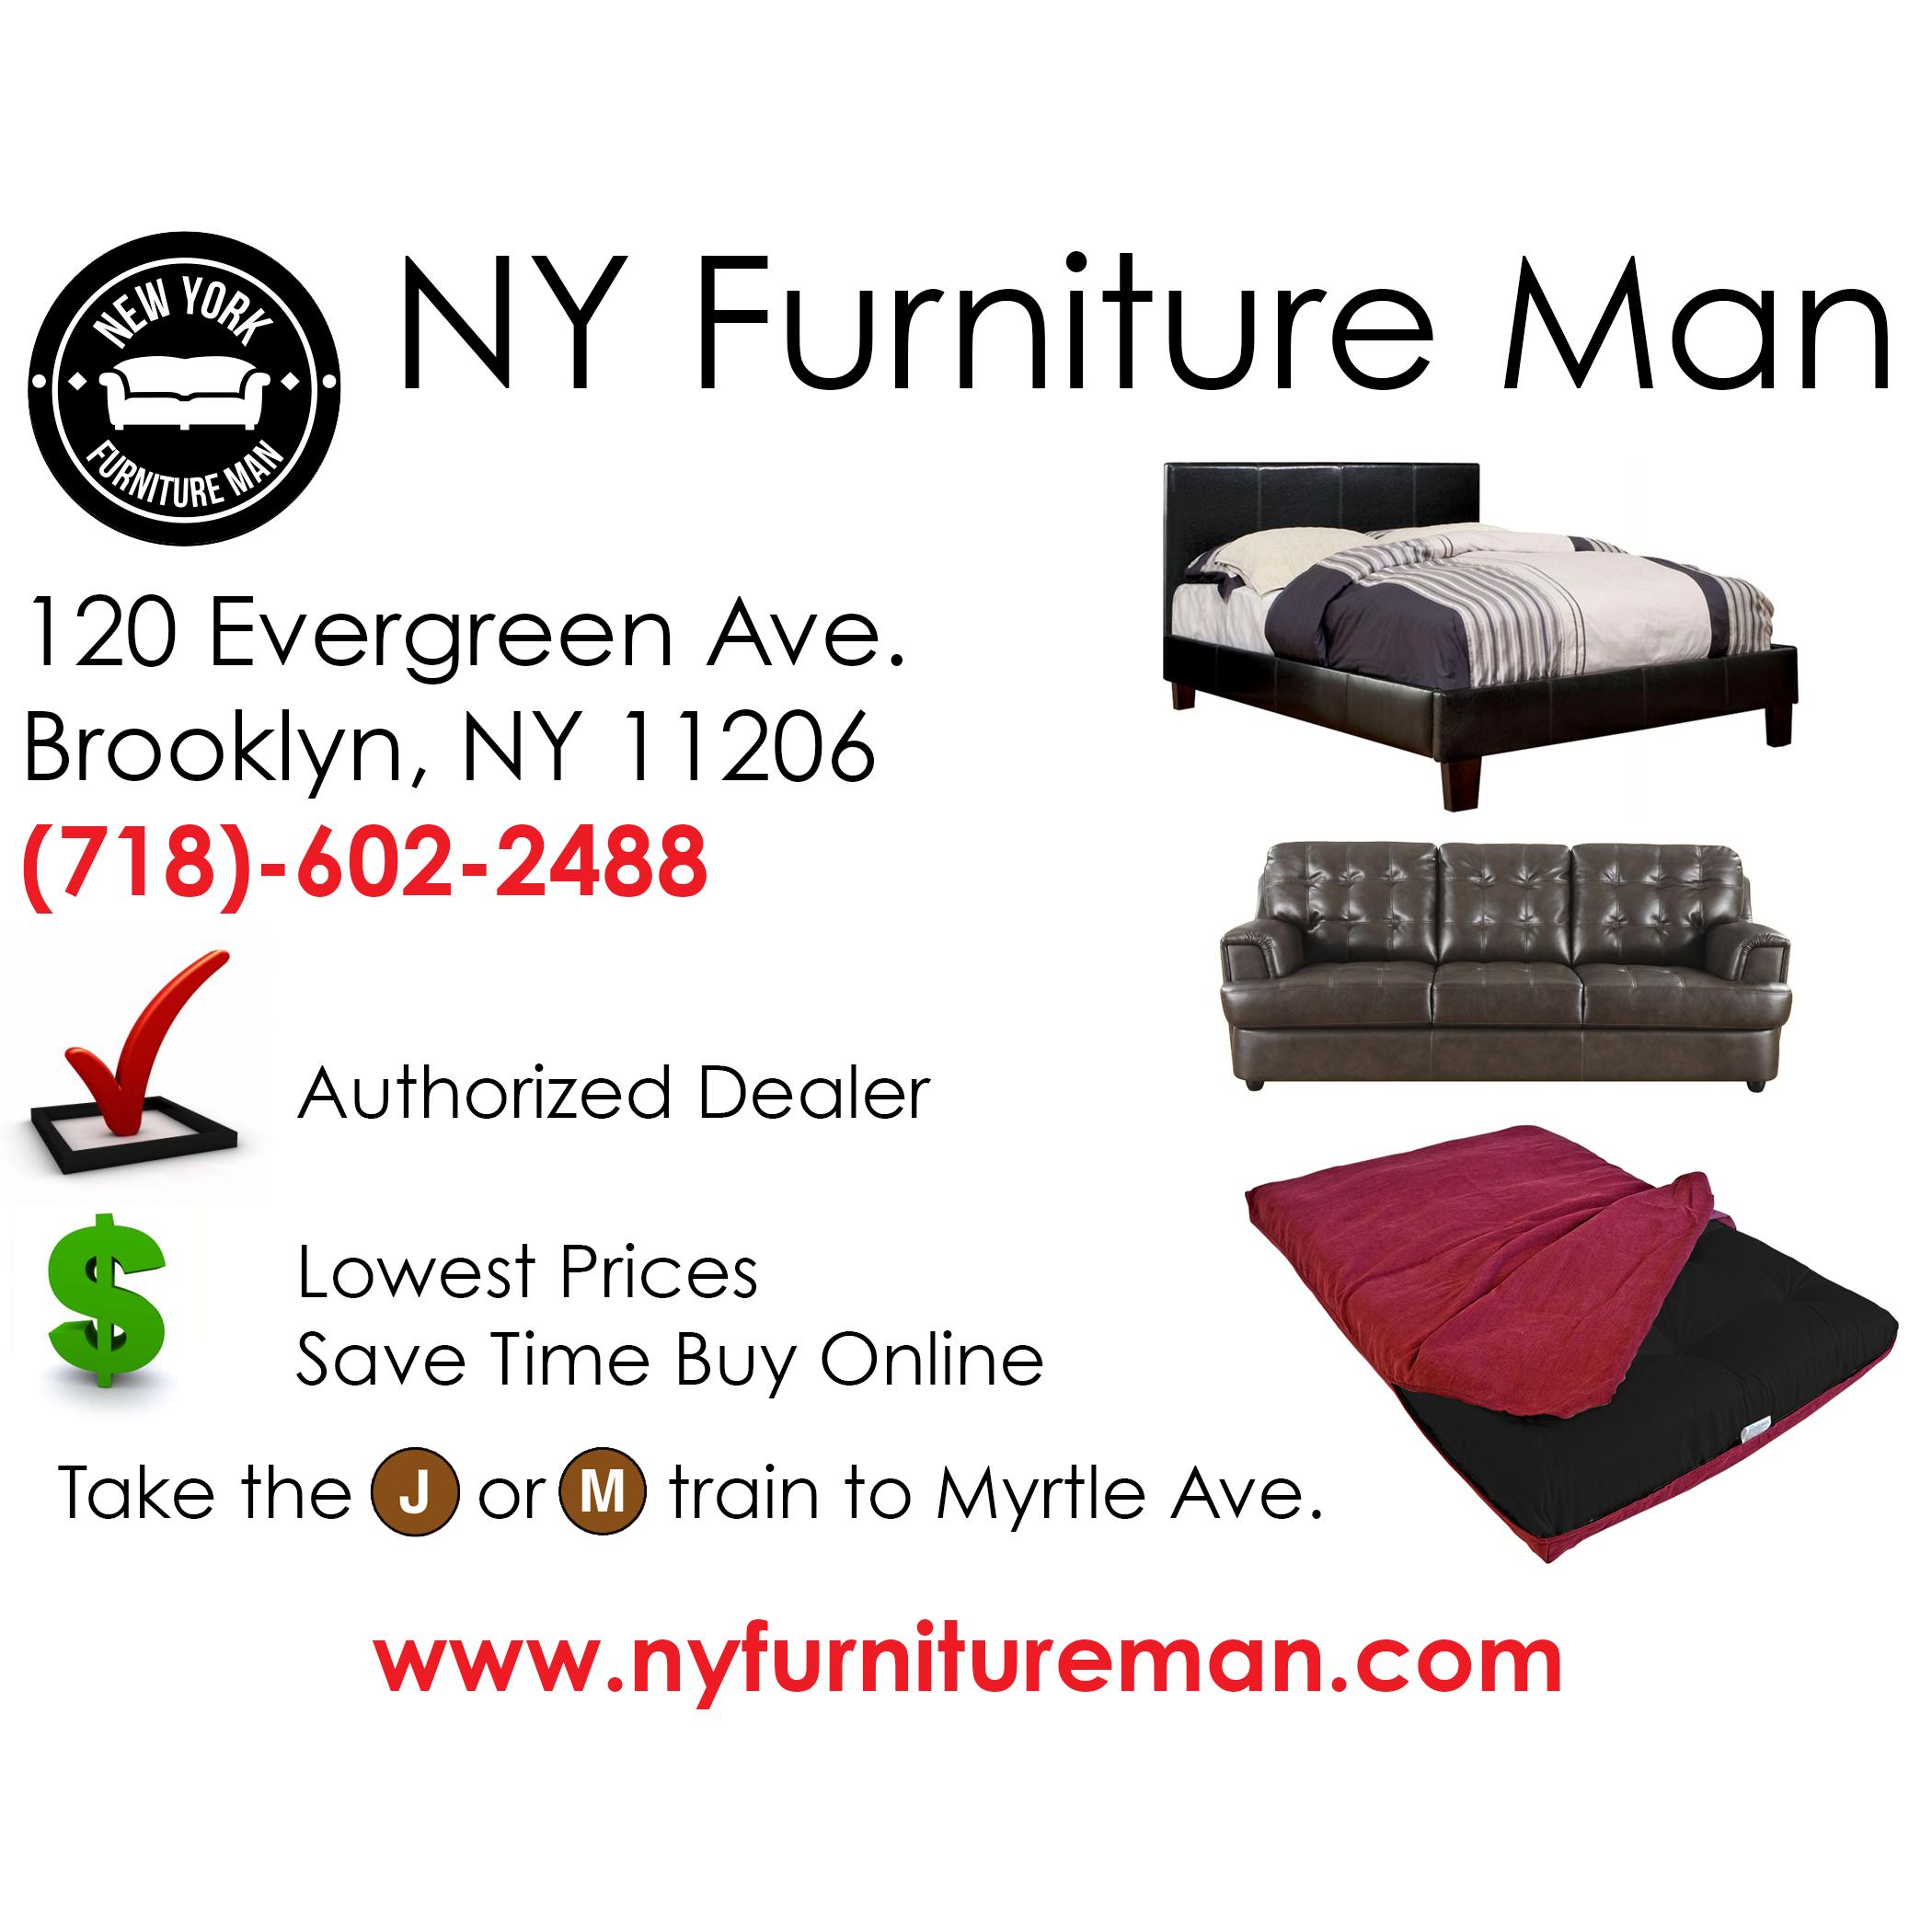 NY Furniture Man